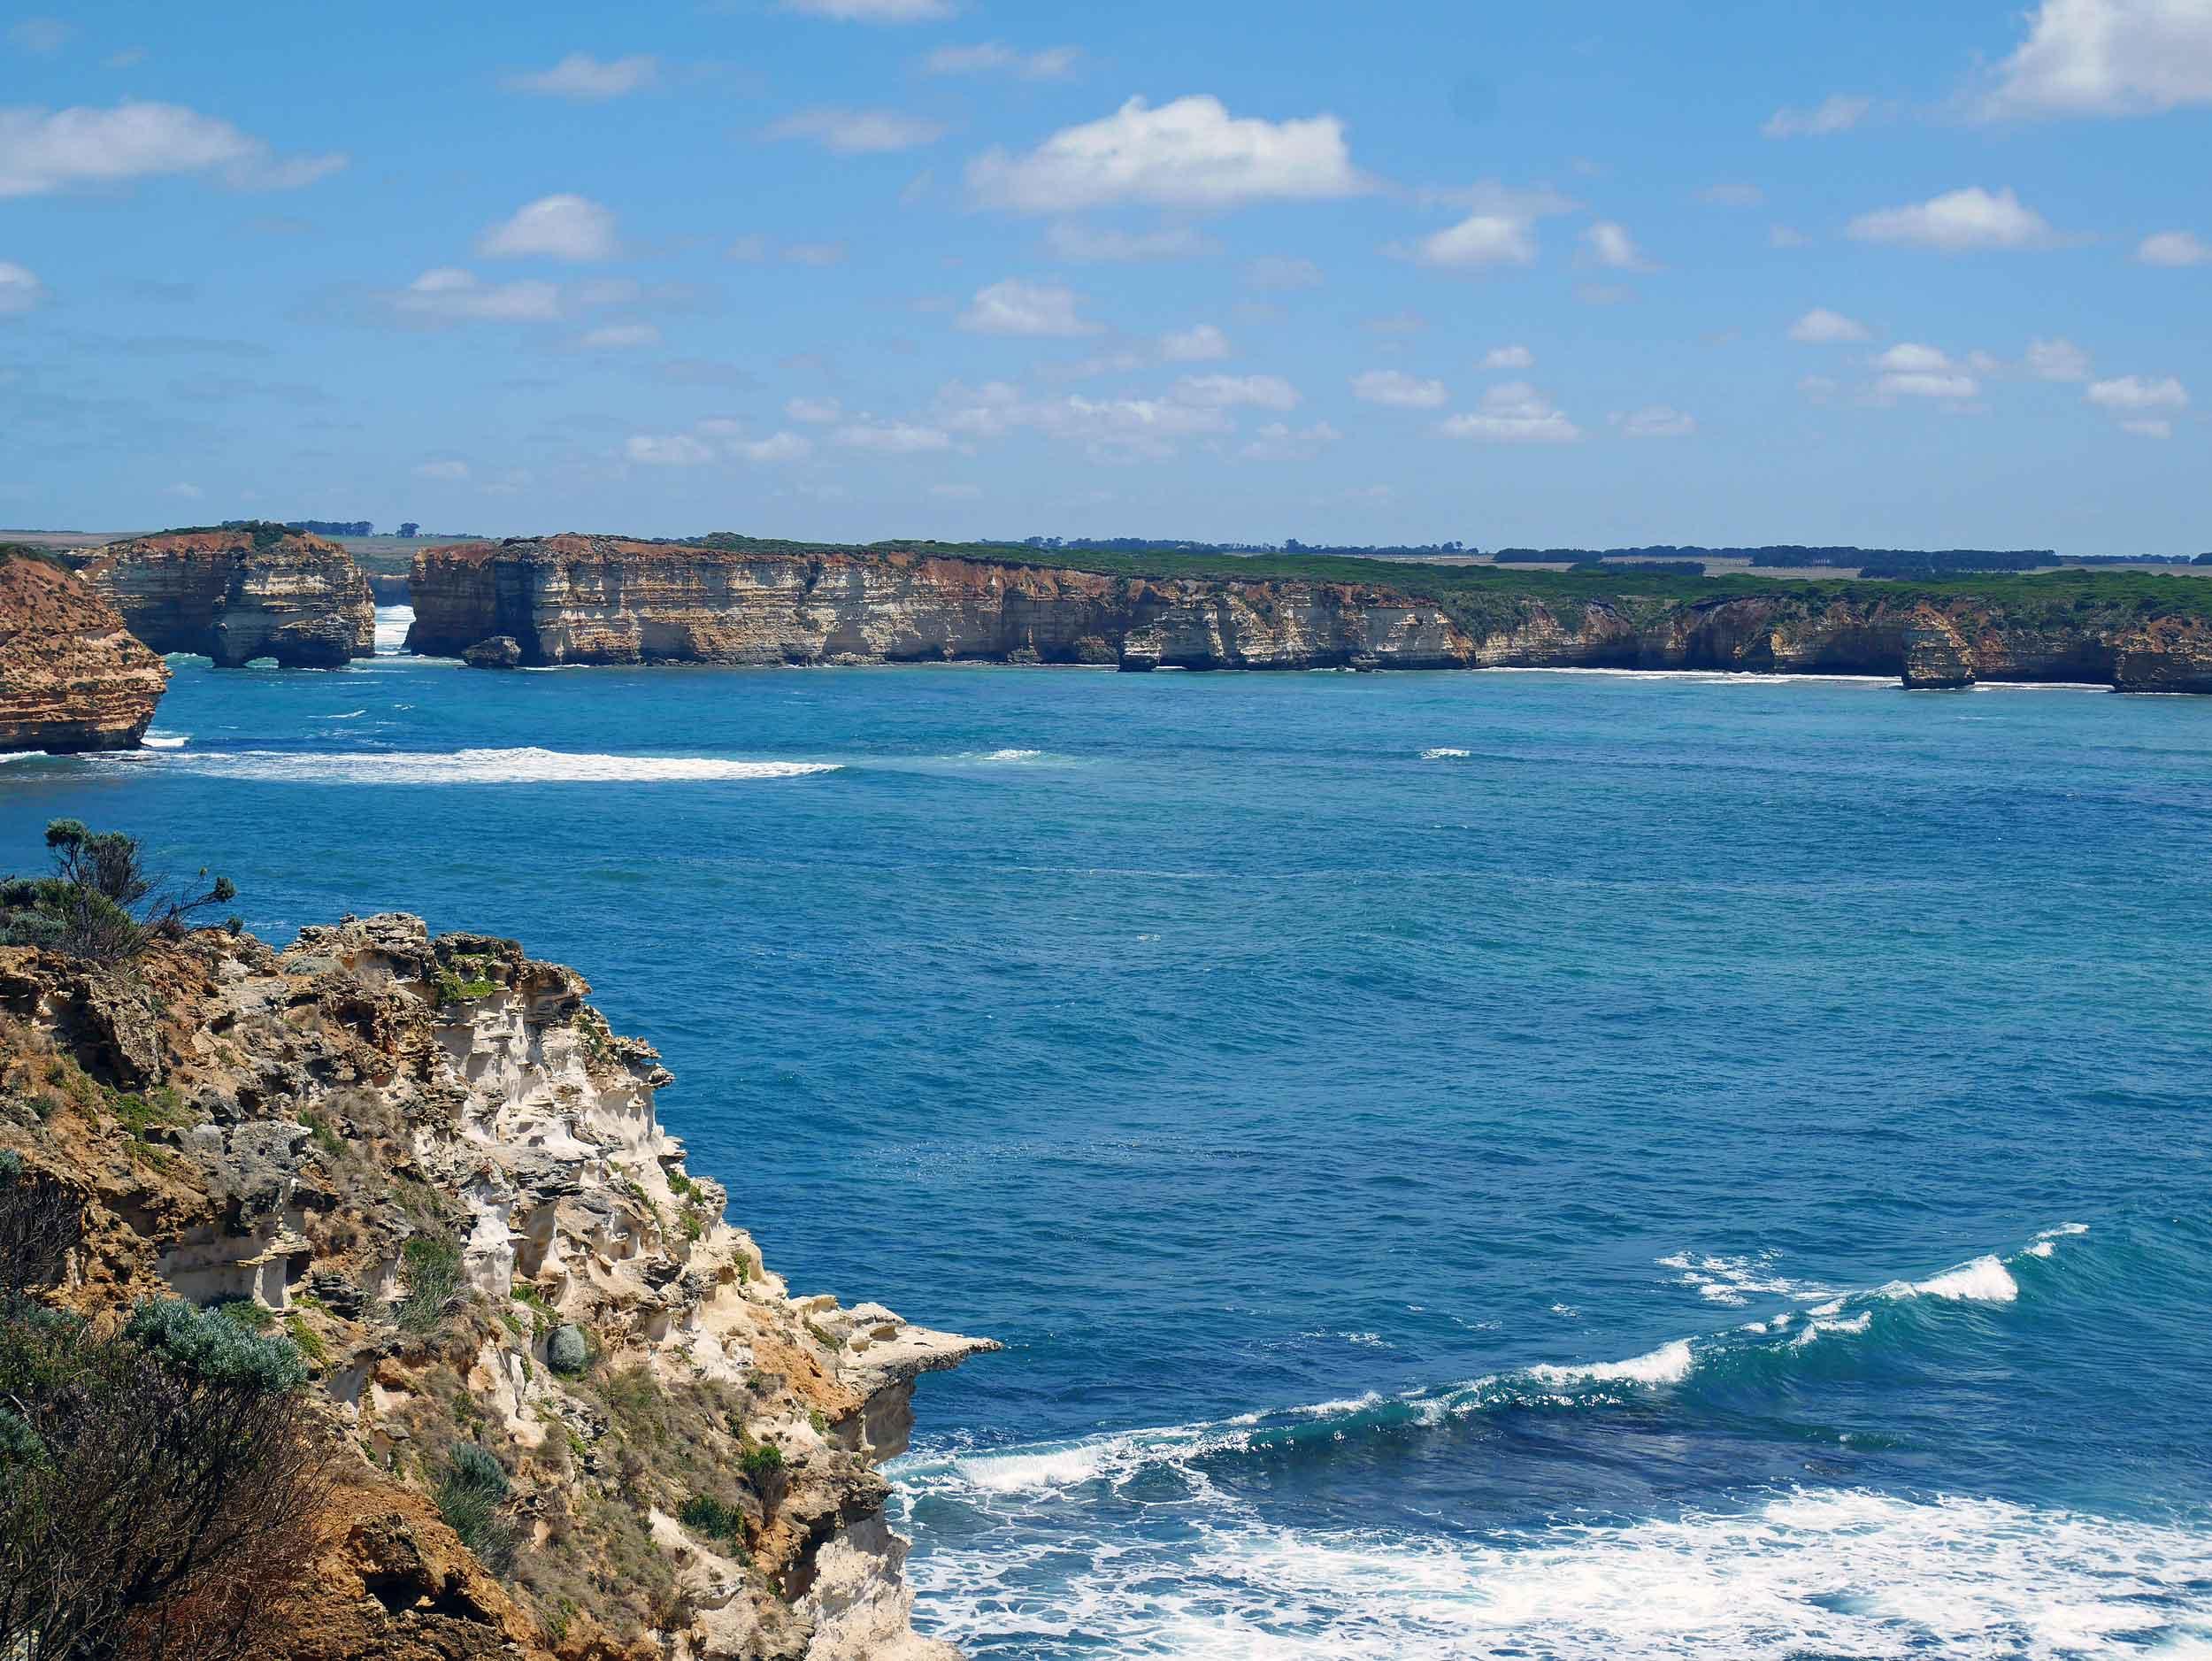 The rugged coastline along the Great Ocean Road, near Bay of Islands (Jan 25).